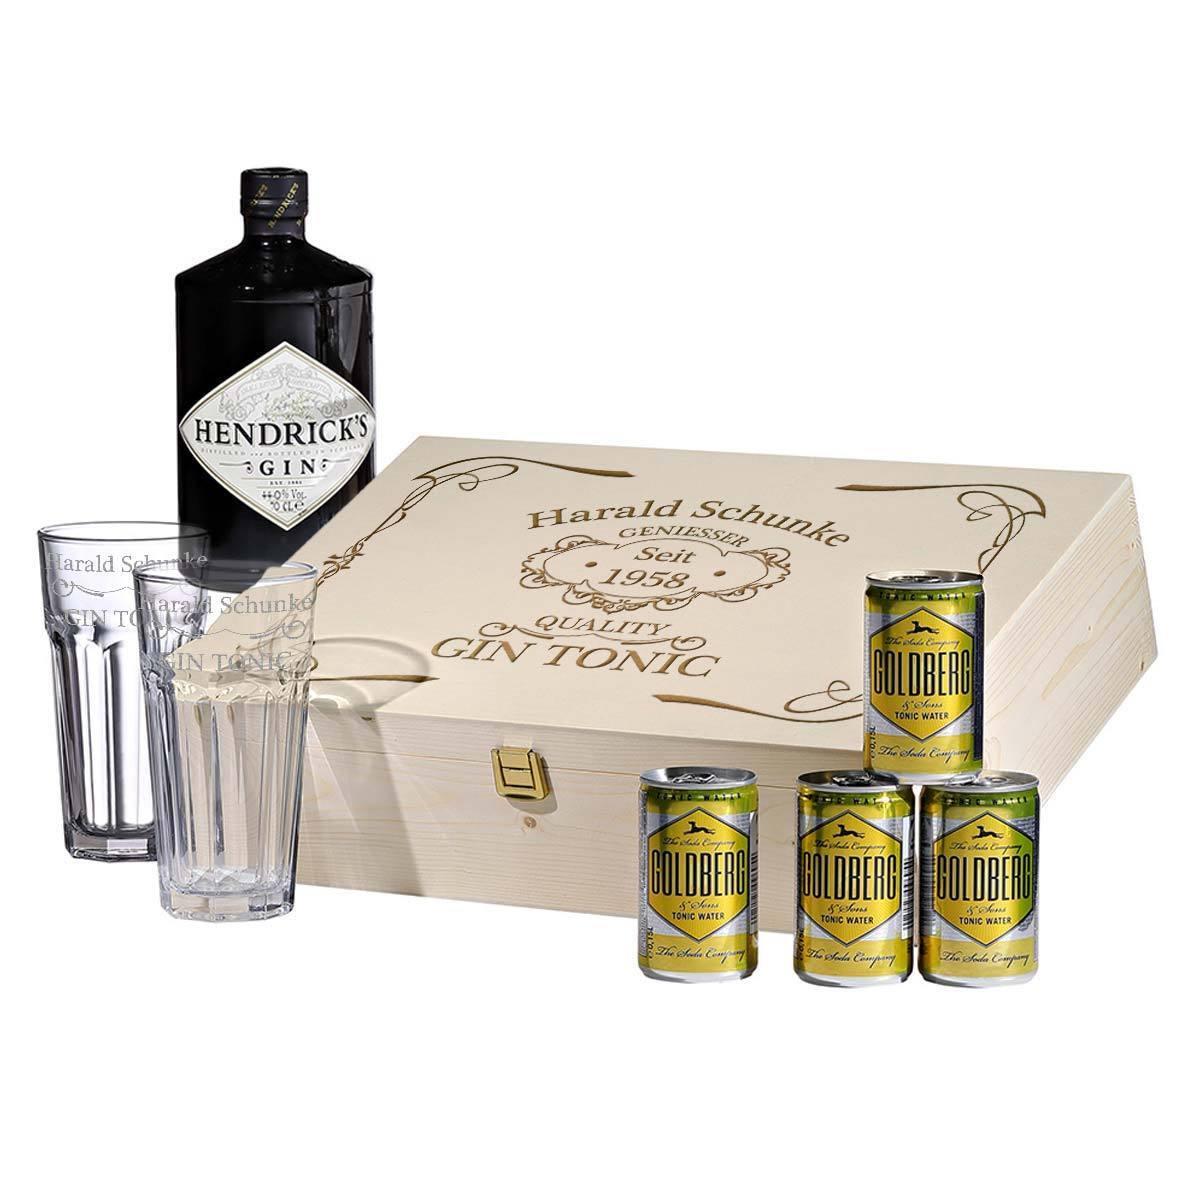 8 pezzi gin-tonic-Set Incl. incisione motivo quality Gin